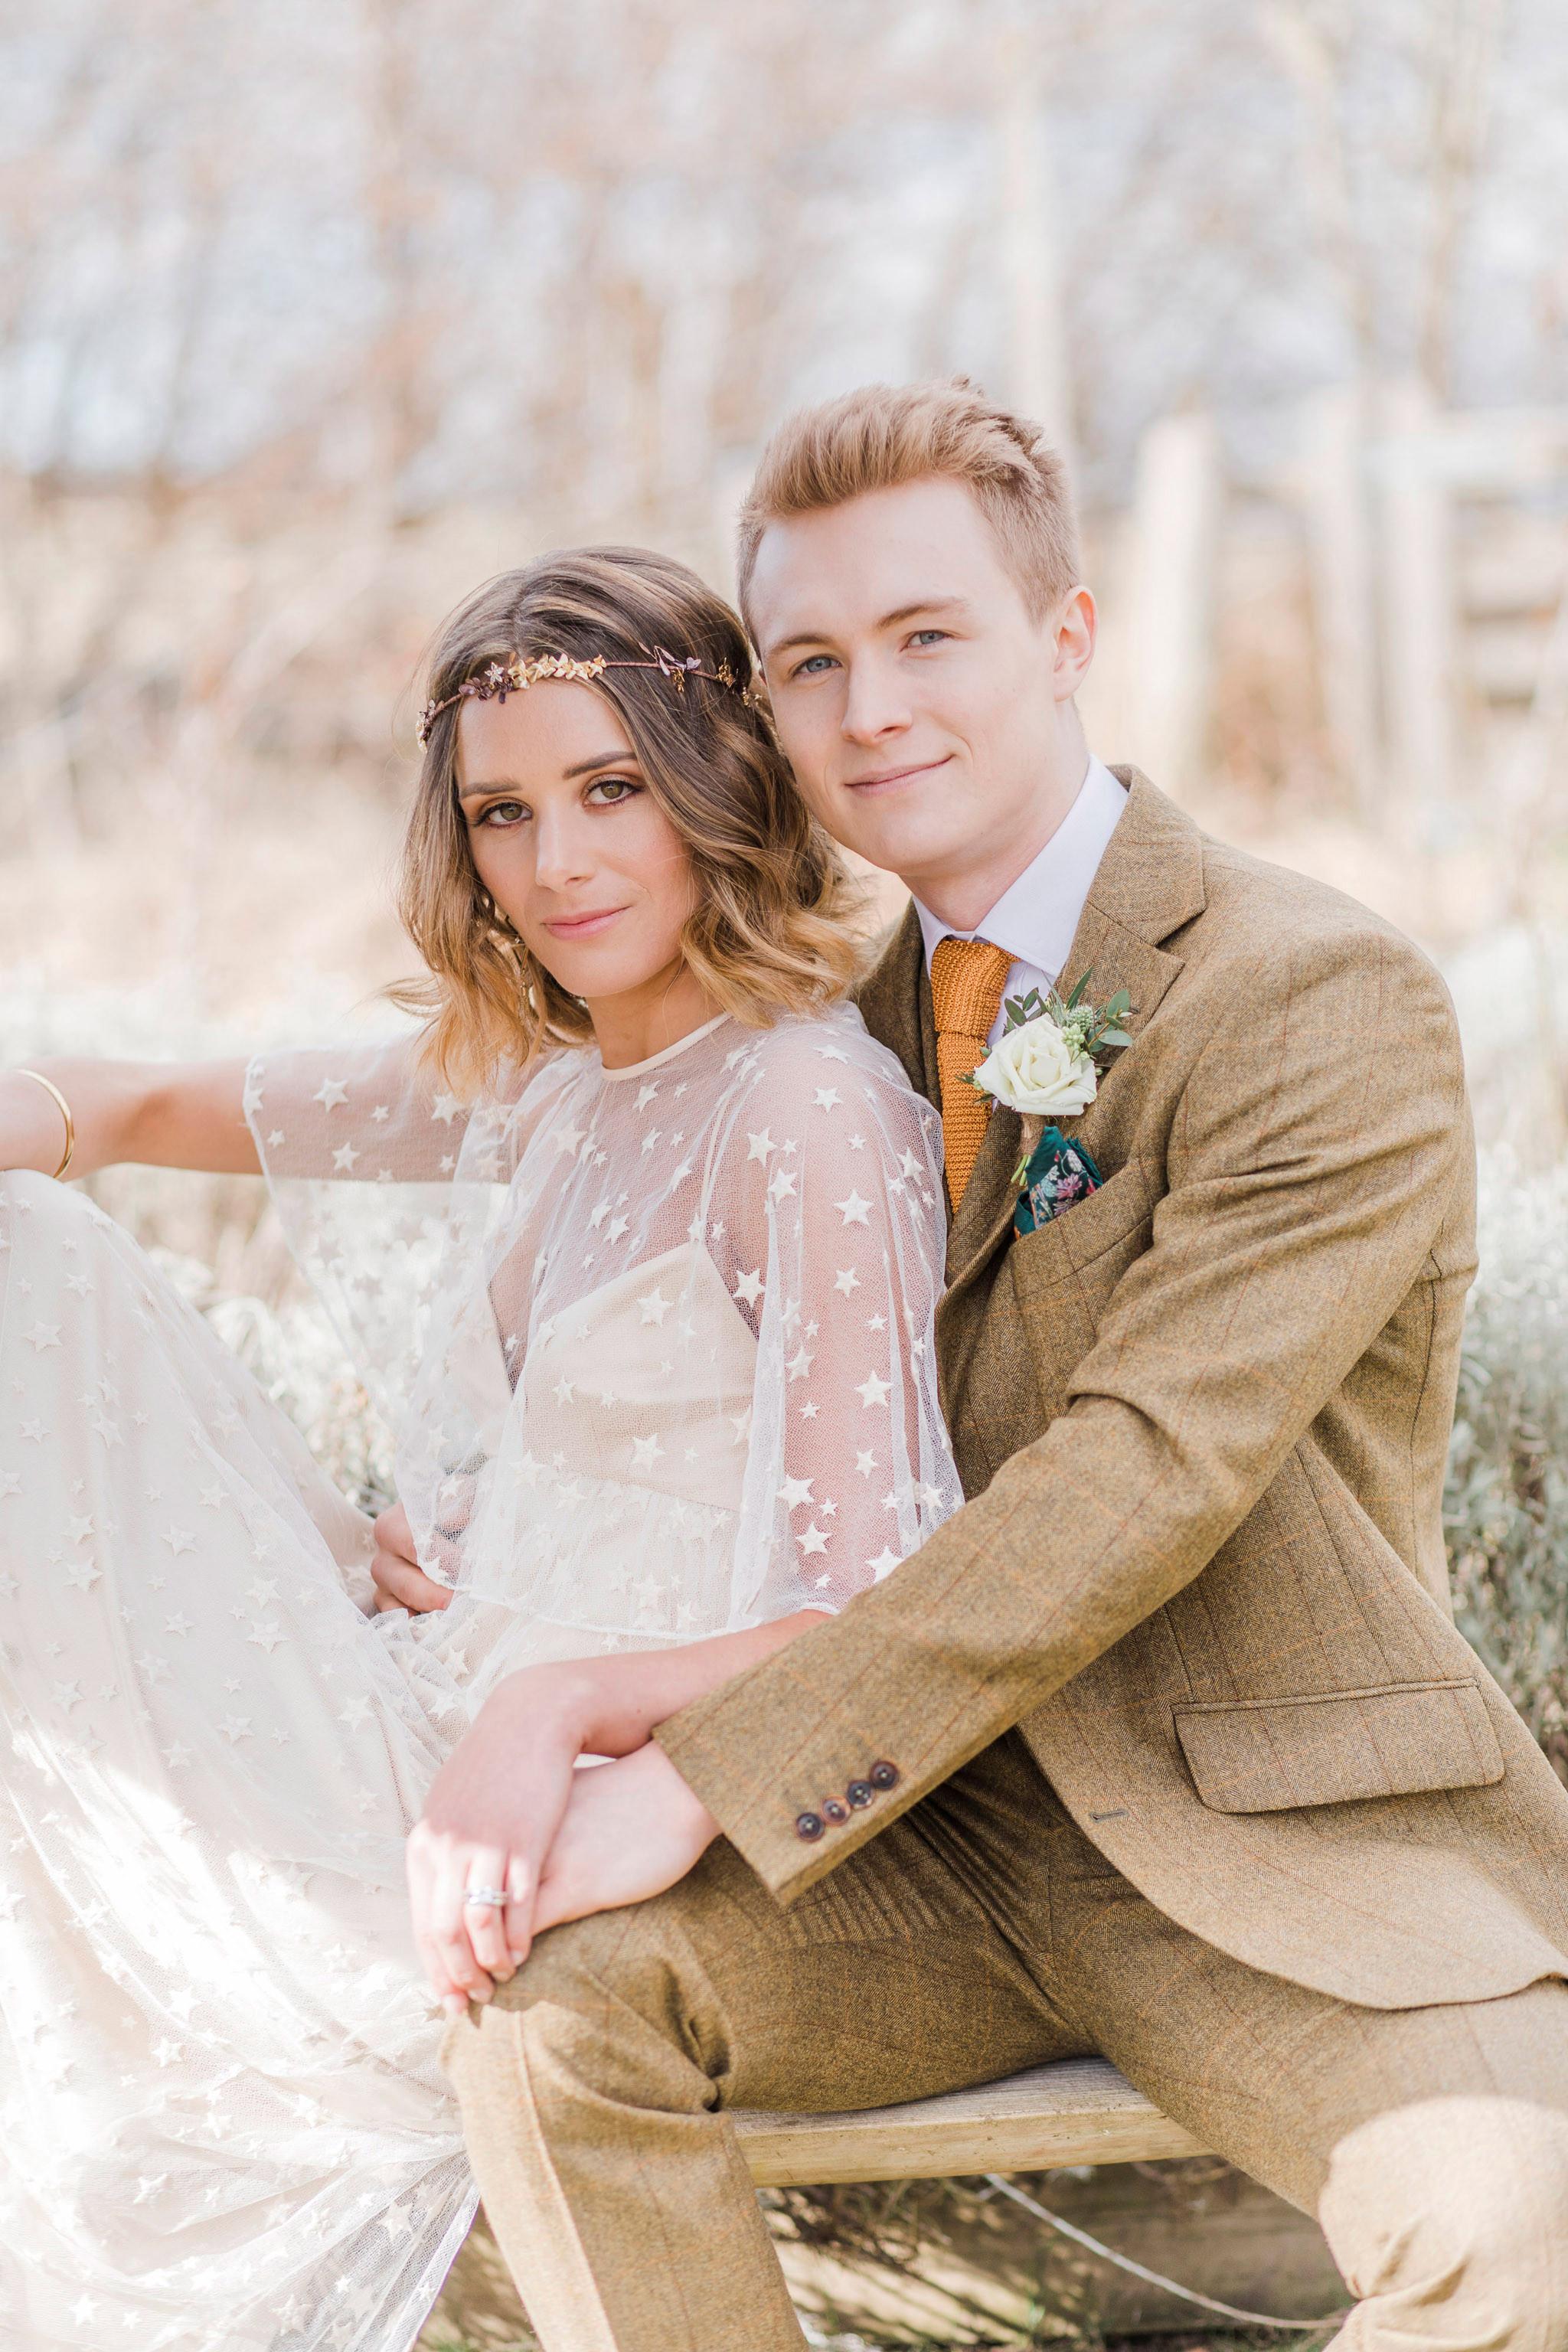 rustic-romantic-outdoor-wedding-photographer-edinburgh-10.jpg